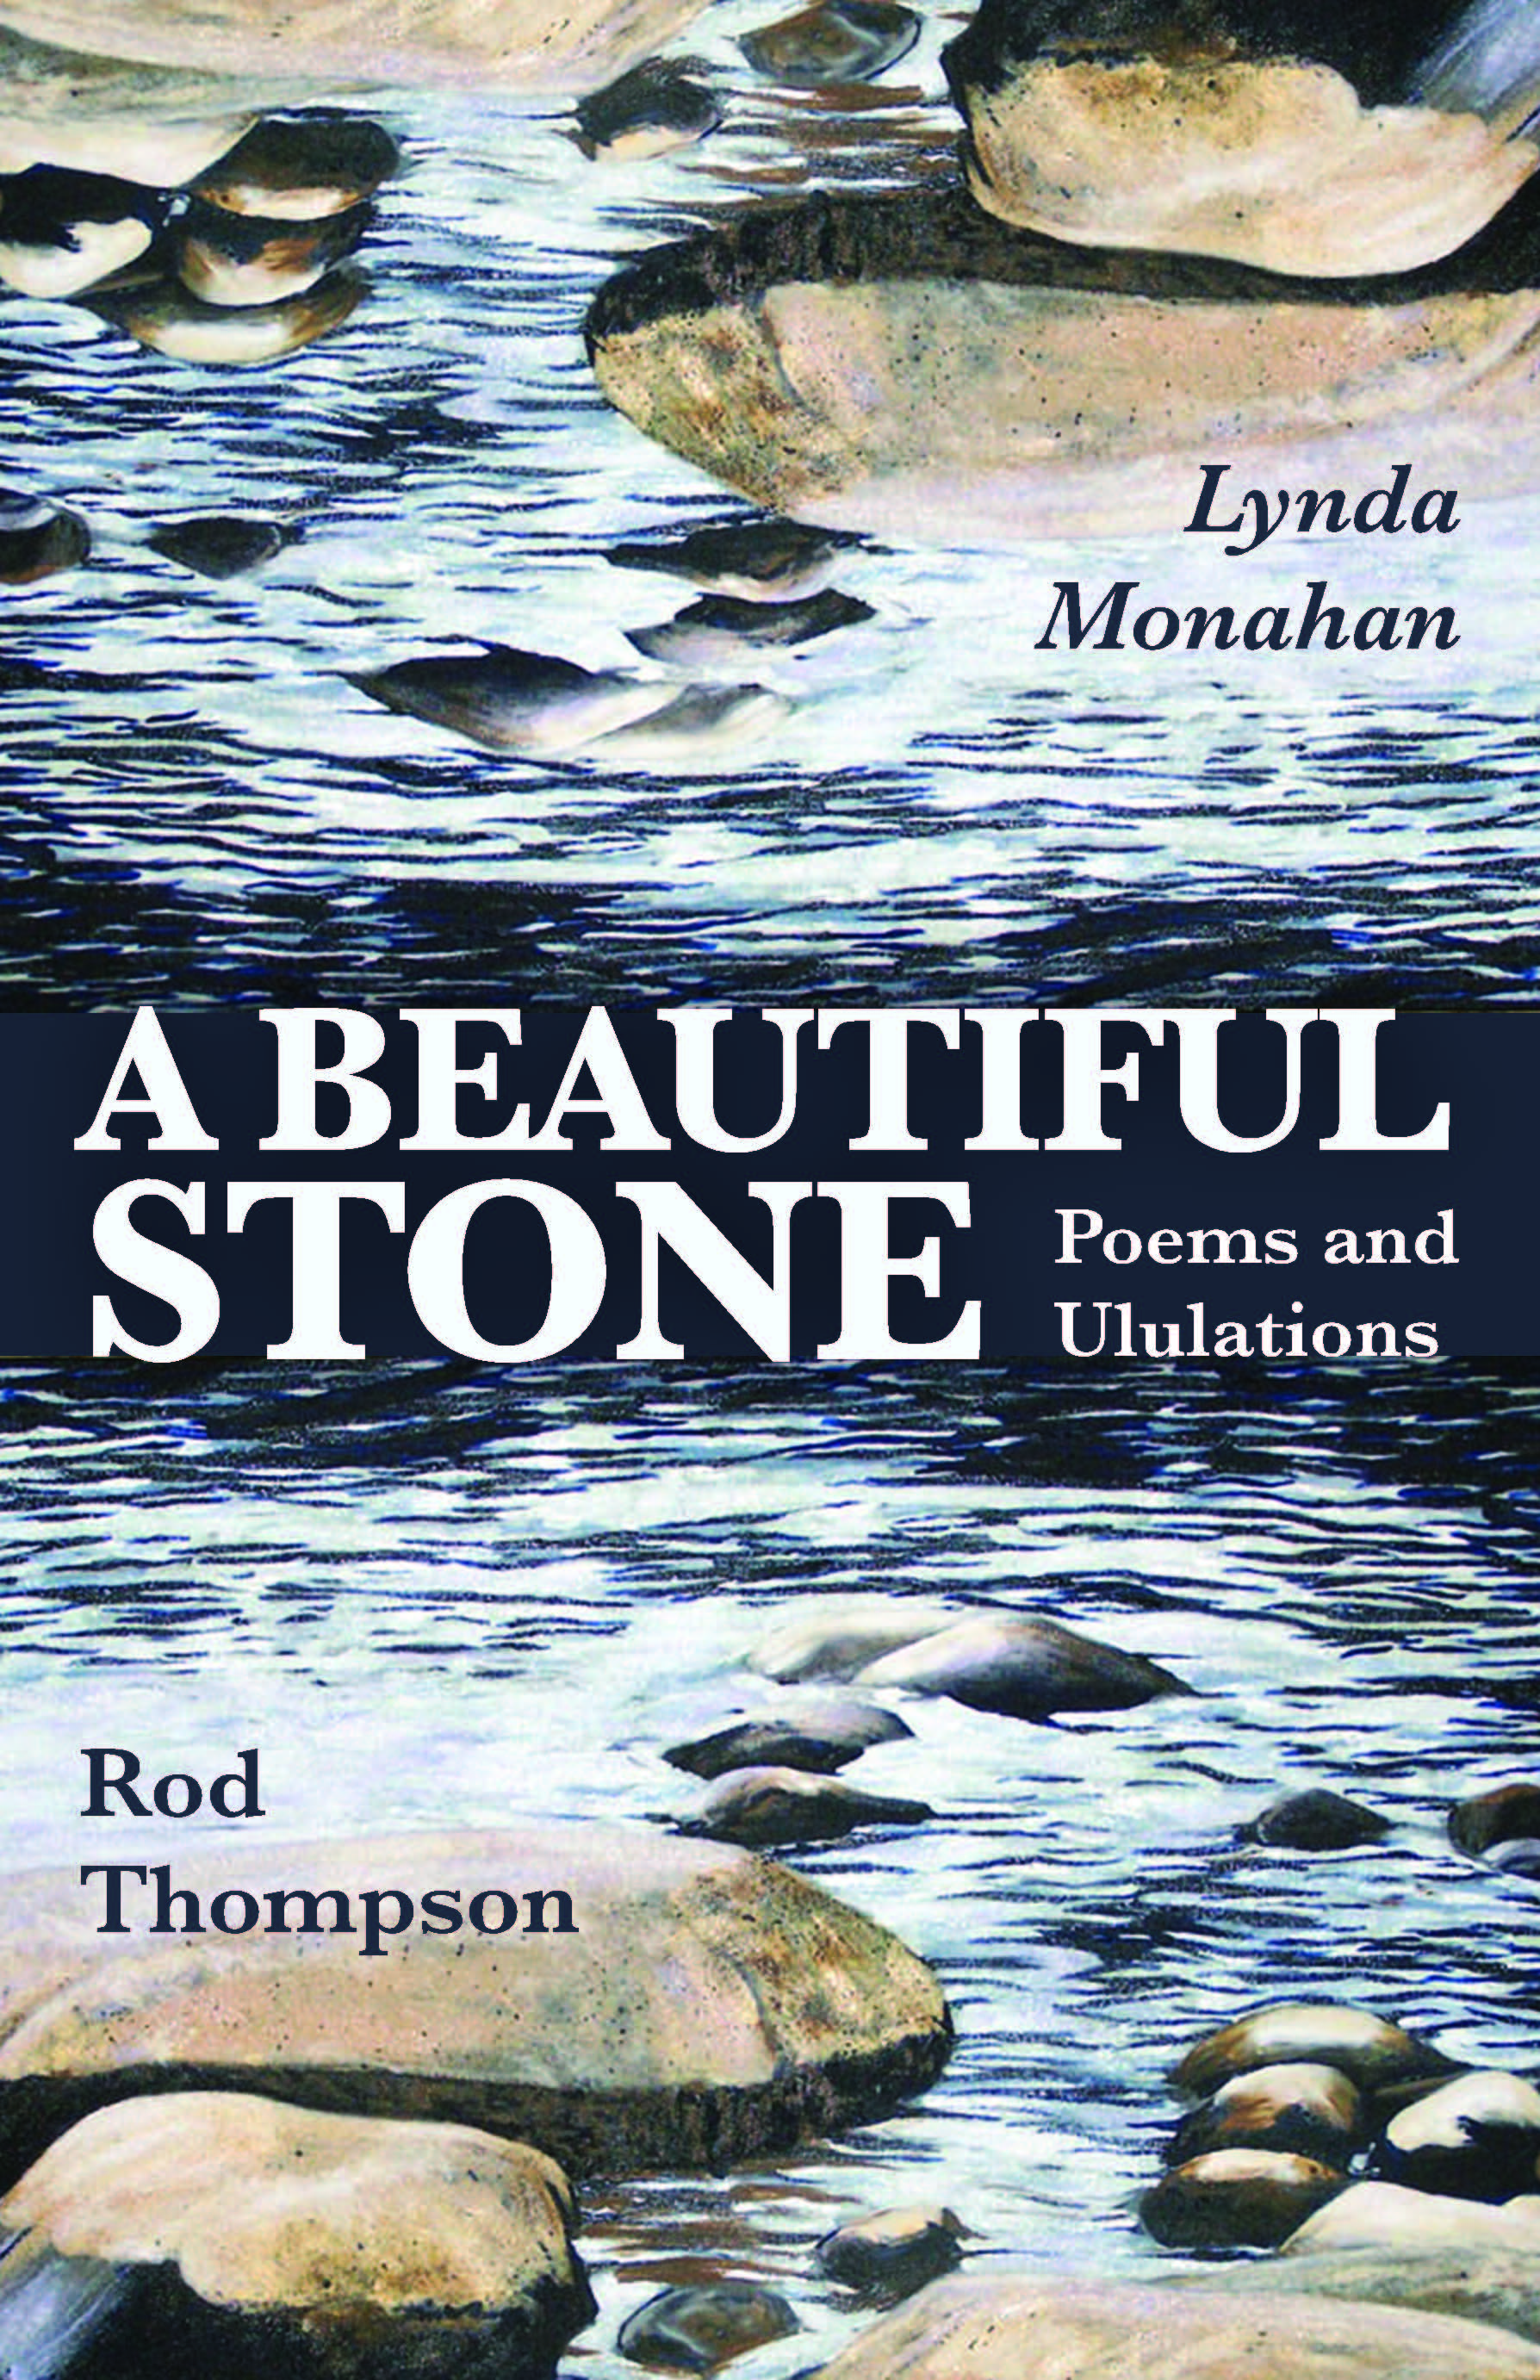 A Beautiful Stone Cover Aug 25 jpg.jpg